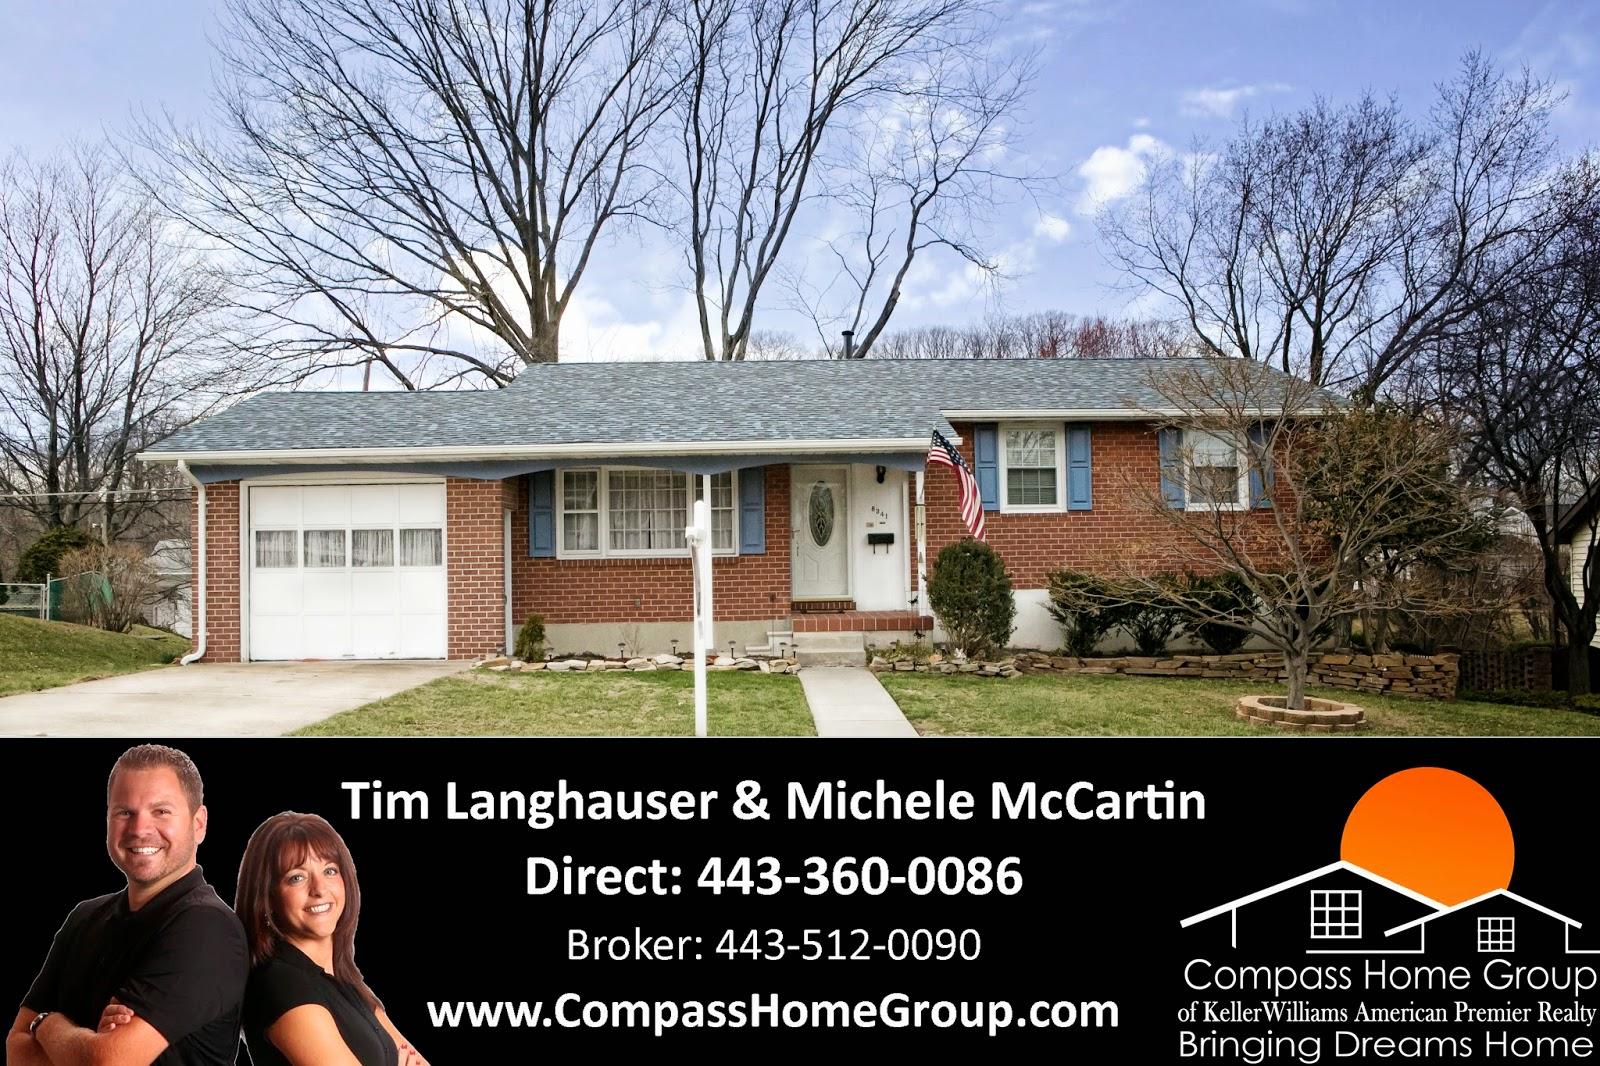 http://www.buy-sellmdhomes.com/listing/mlsid/161/propertyid/BC8297705/